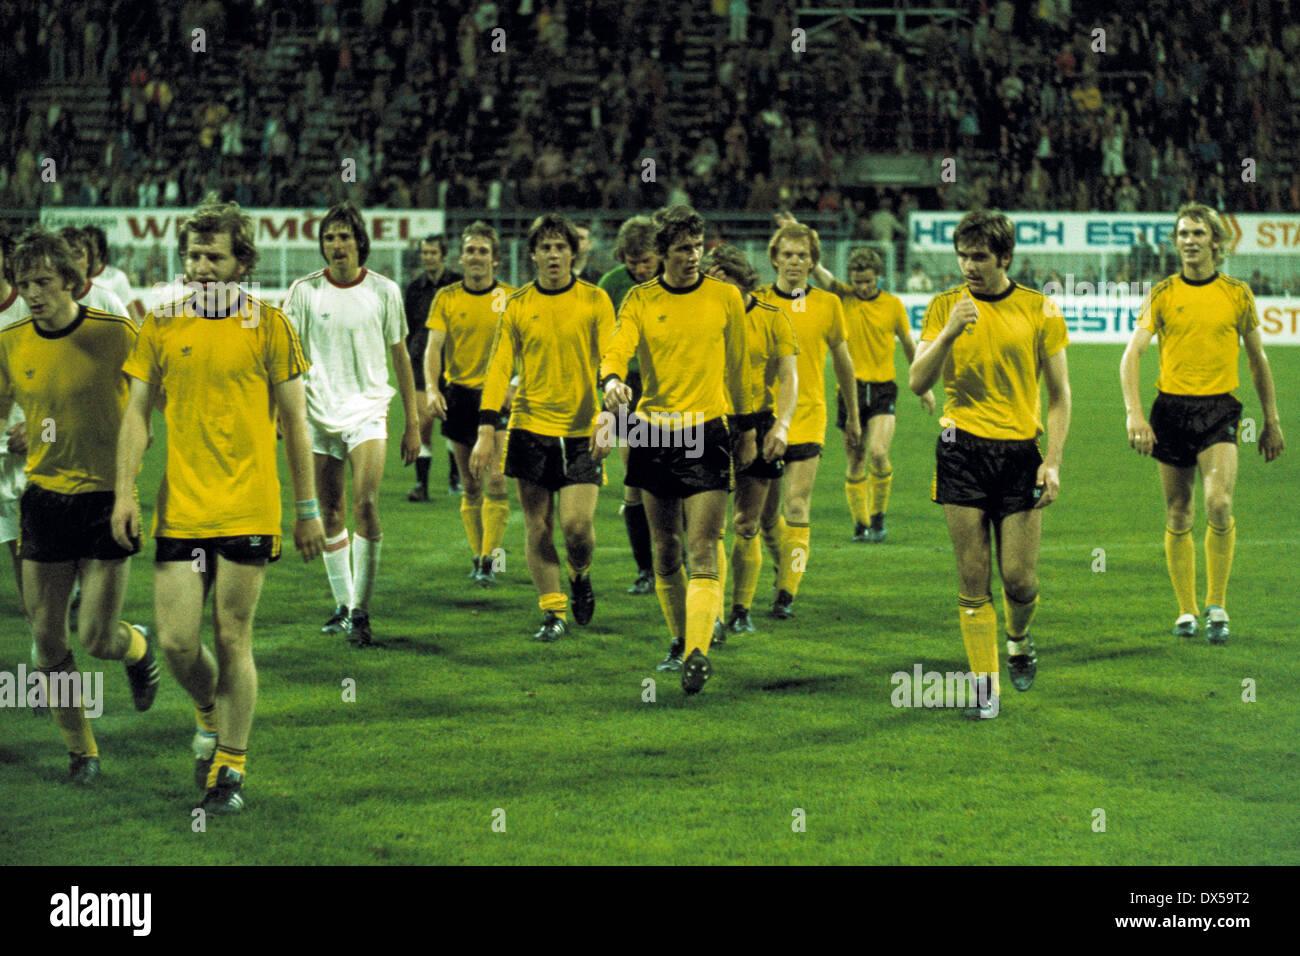 football, 2. Bundesliga Nord, 1974/1975, Westfalen Stadium, Borussia Dortmund versus Rot Weiss Oberhausen 4:0, end of the match, leaving, f.l.t.r. Klaus Ackermann (BVB), Lothar Huber (BVB), Stojan Vukasinovic (RWO), Hans-Gerd Schildt (BVB), Friedhelm Schw - Stock Image